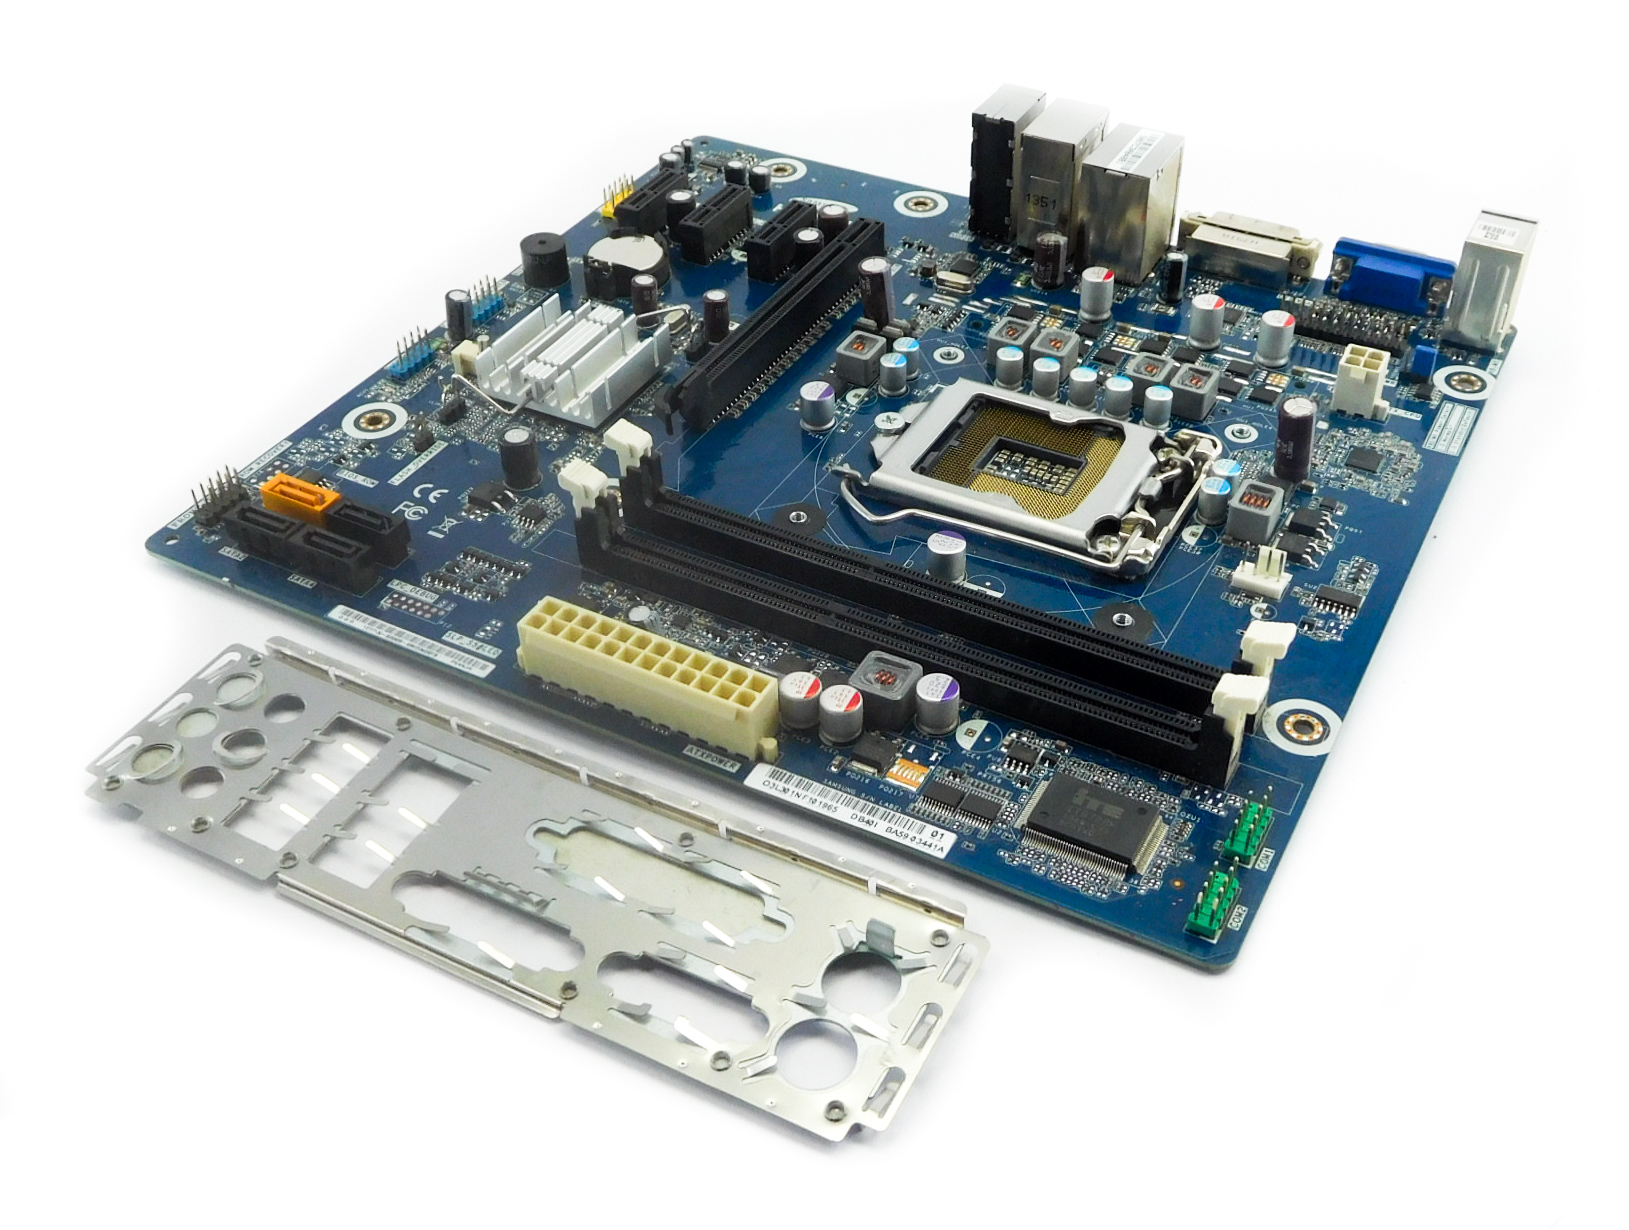 Samsung BA59-03441 LGA 1155 Motherboard H61S1 MP 1.0